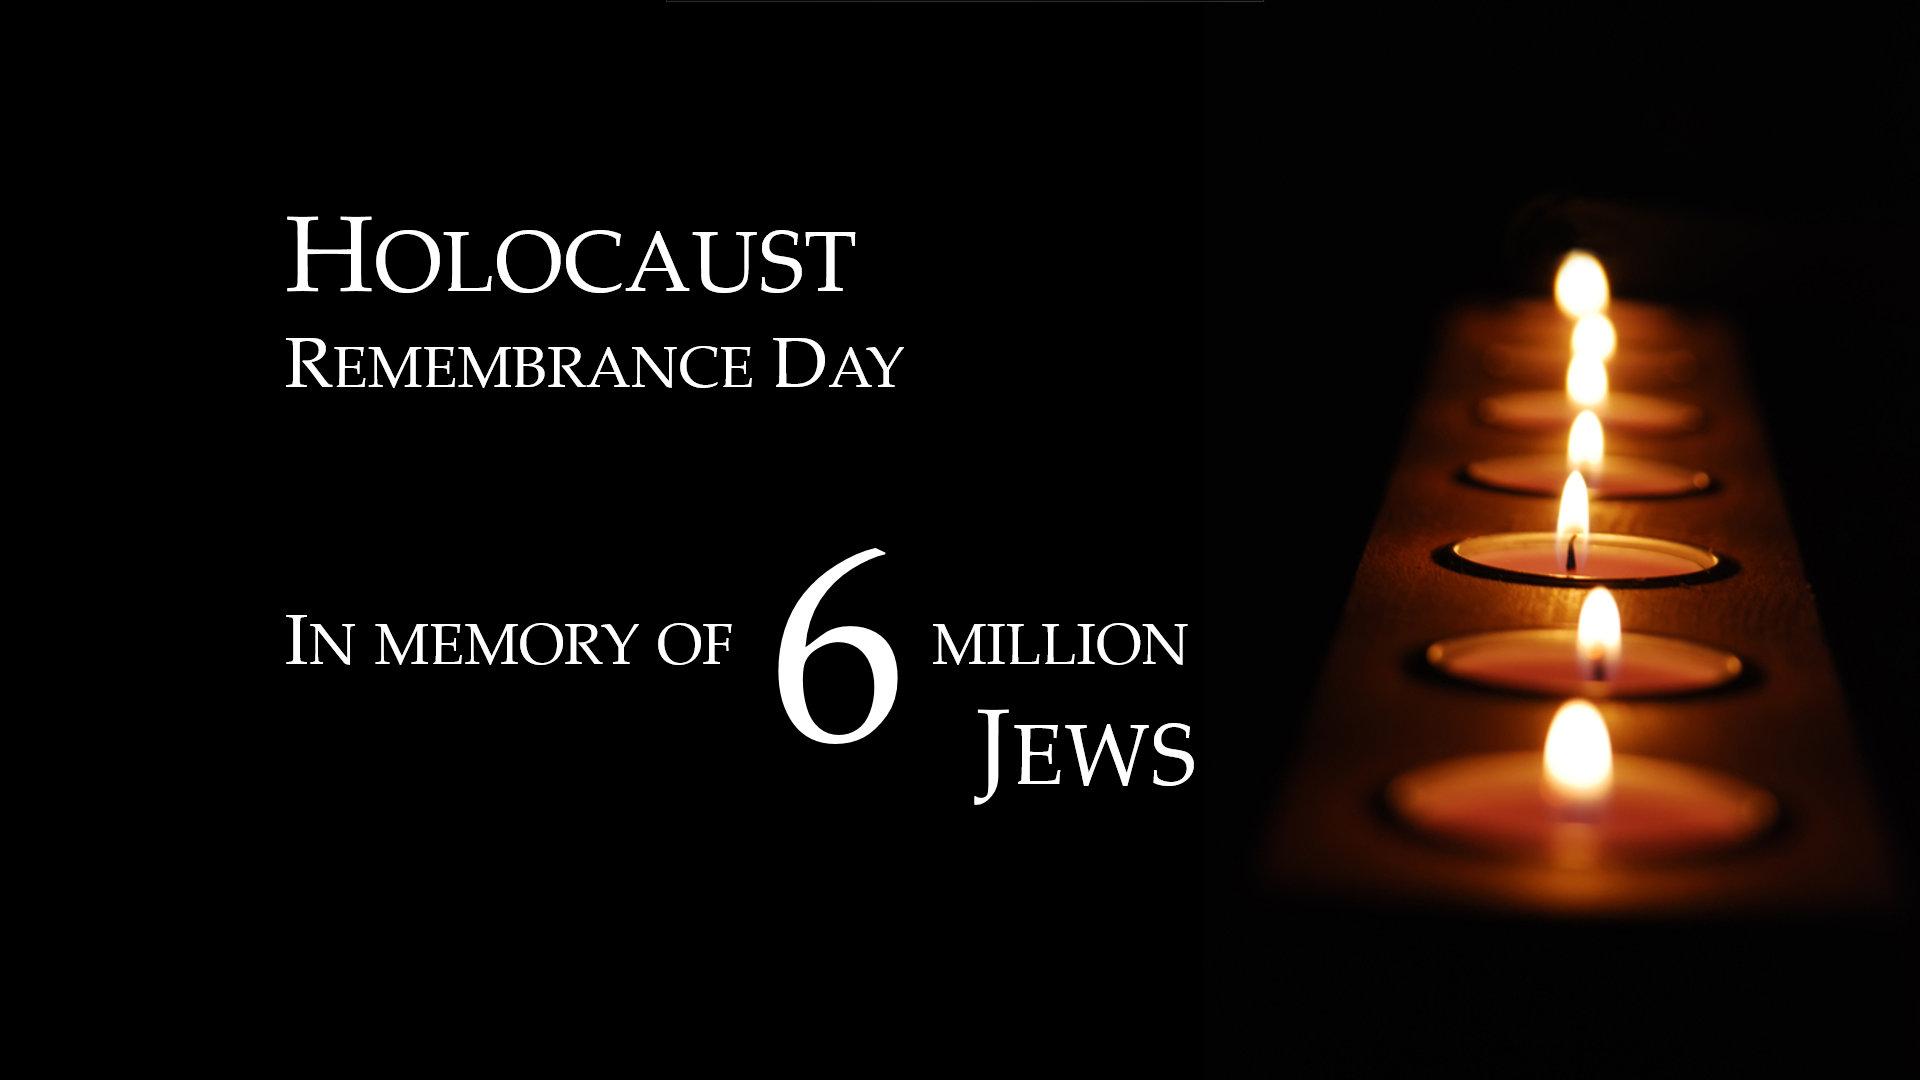 HolocaustRemembrance.jpg